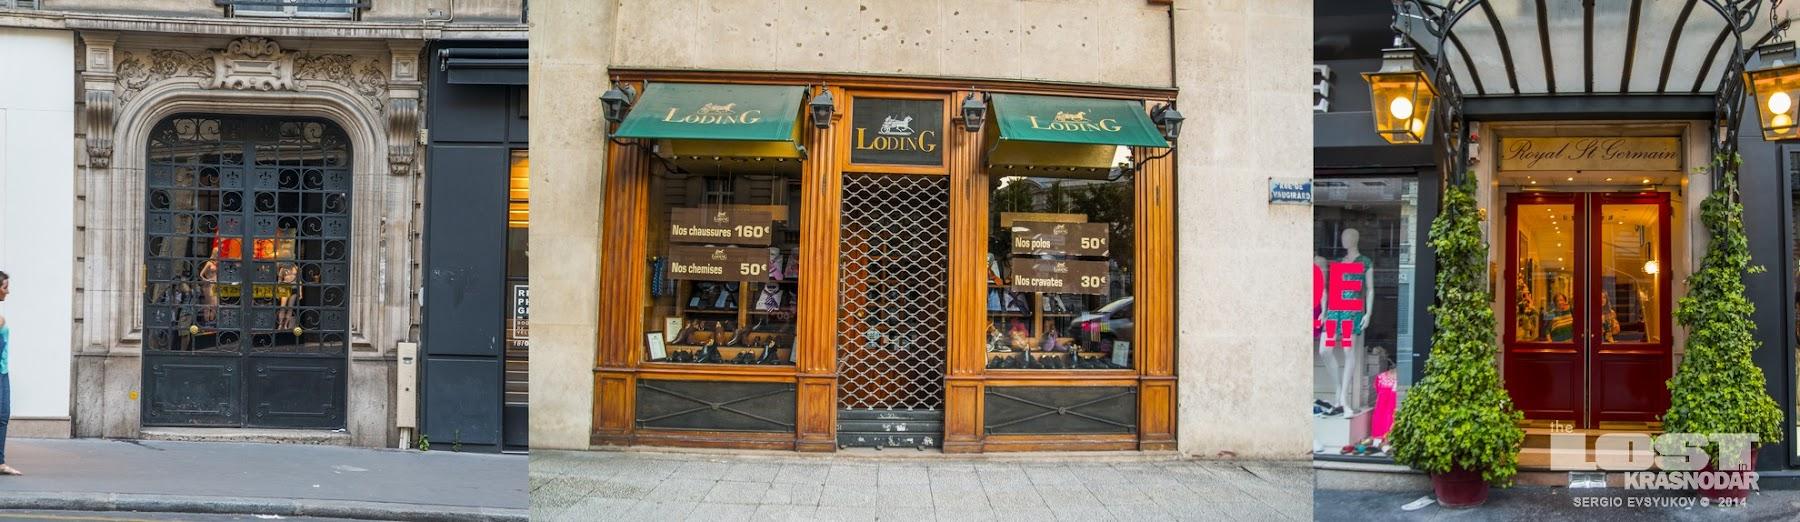 Parisian front doors